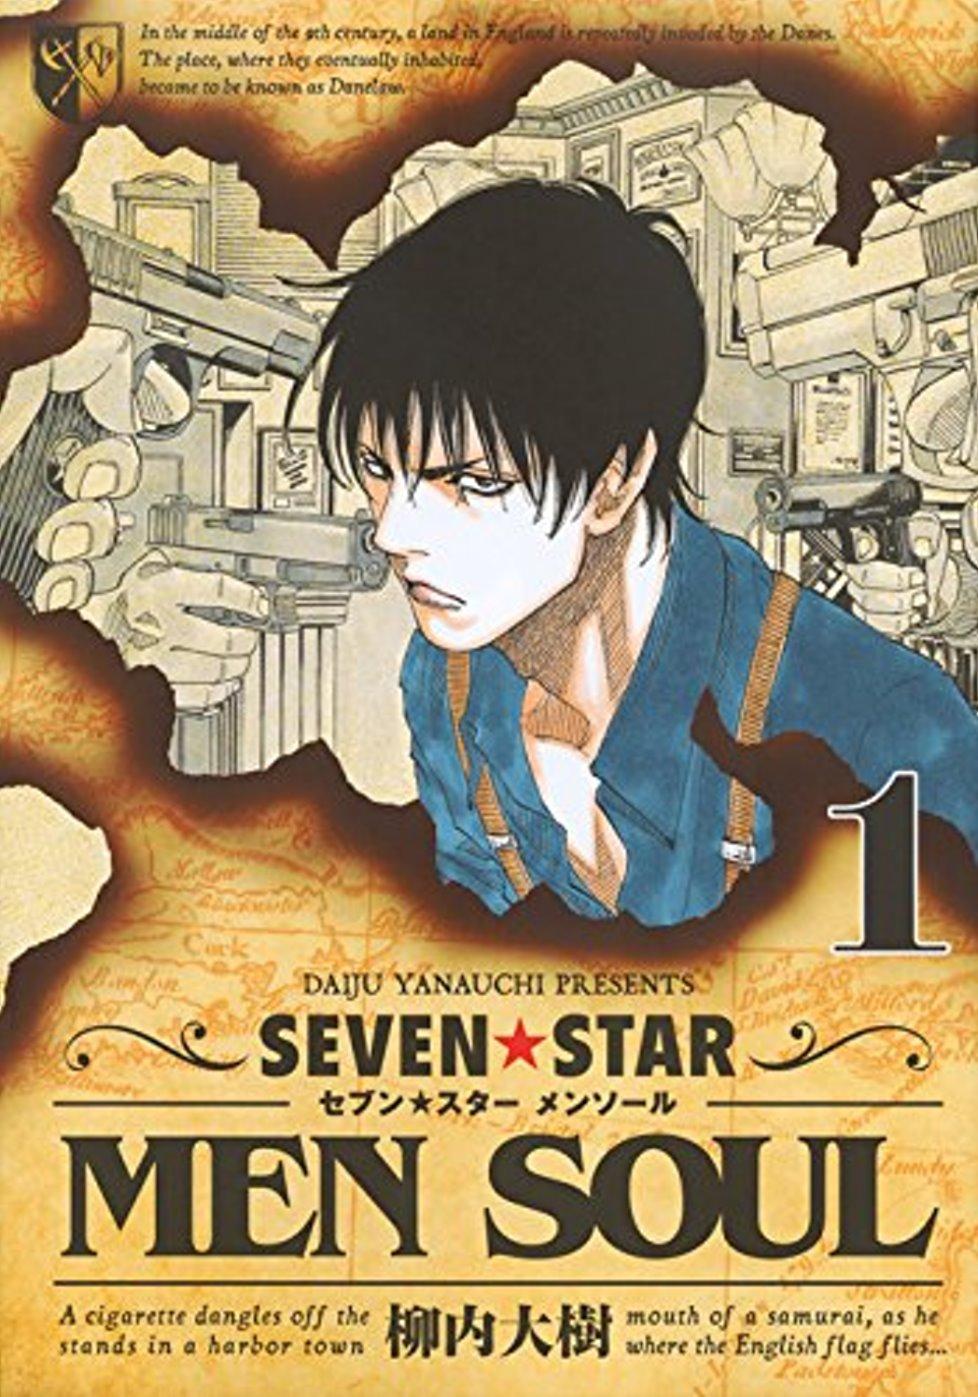 SEVEN~STAR MEN SOUL 1